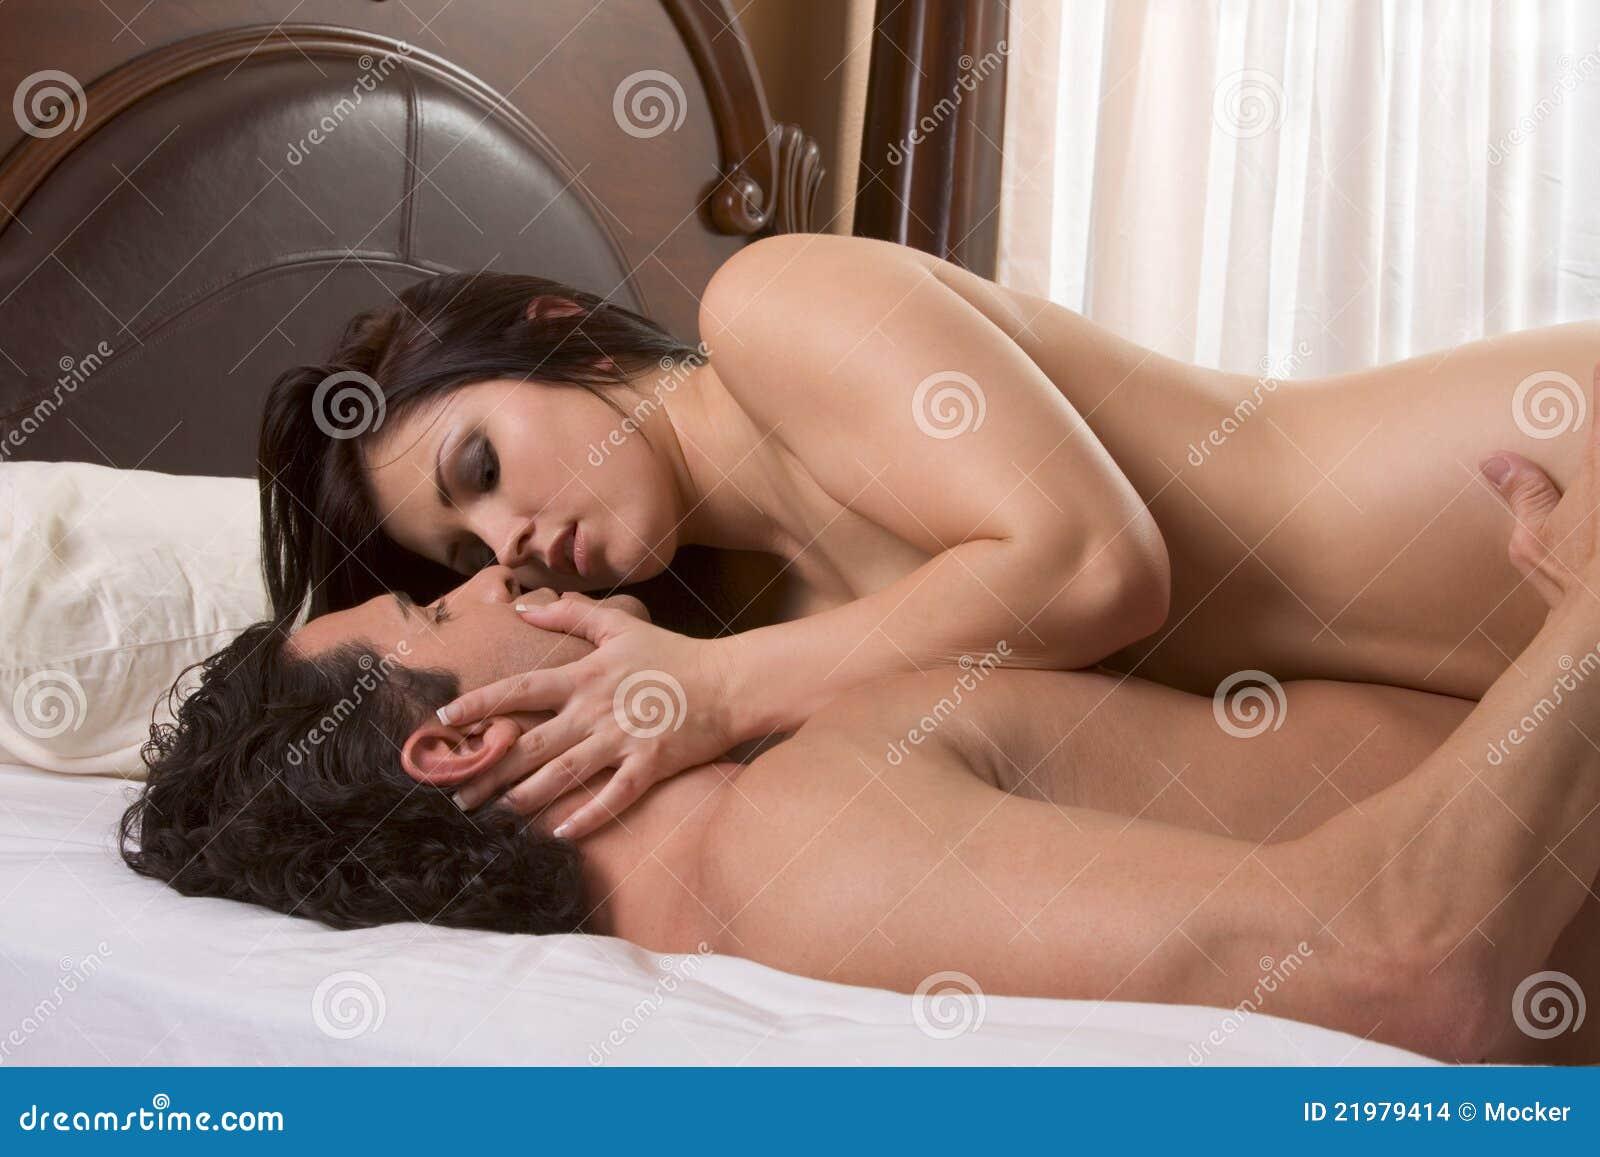 sex milf lesben im bett